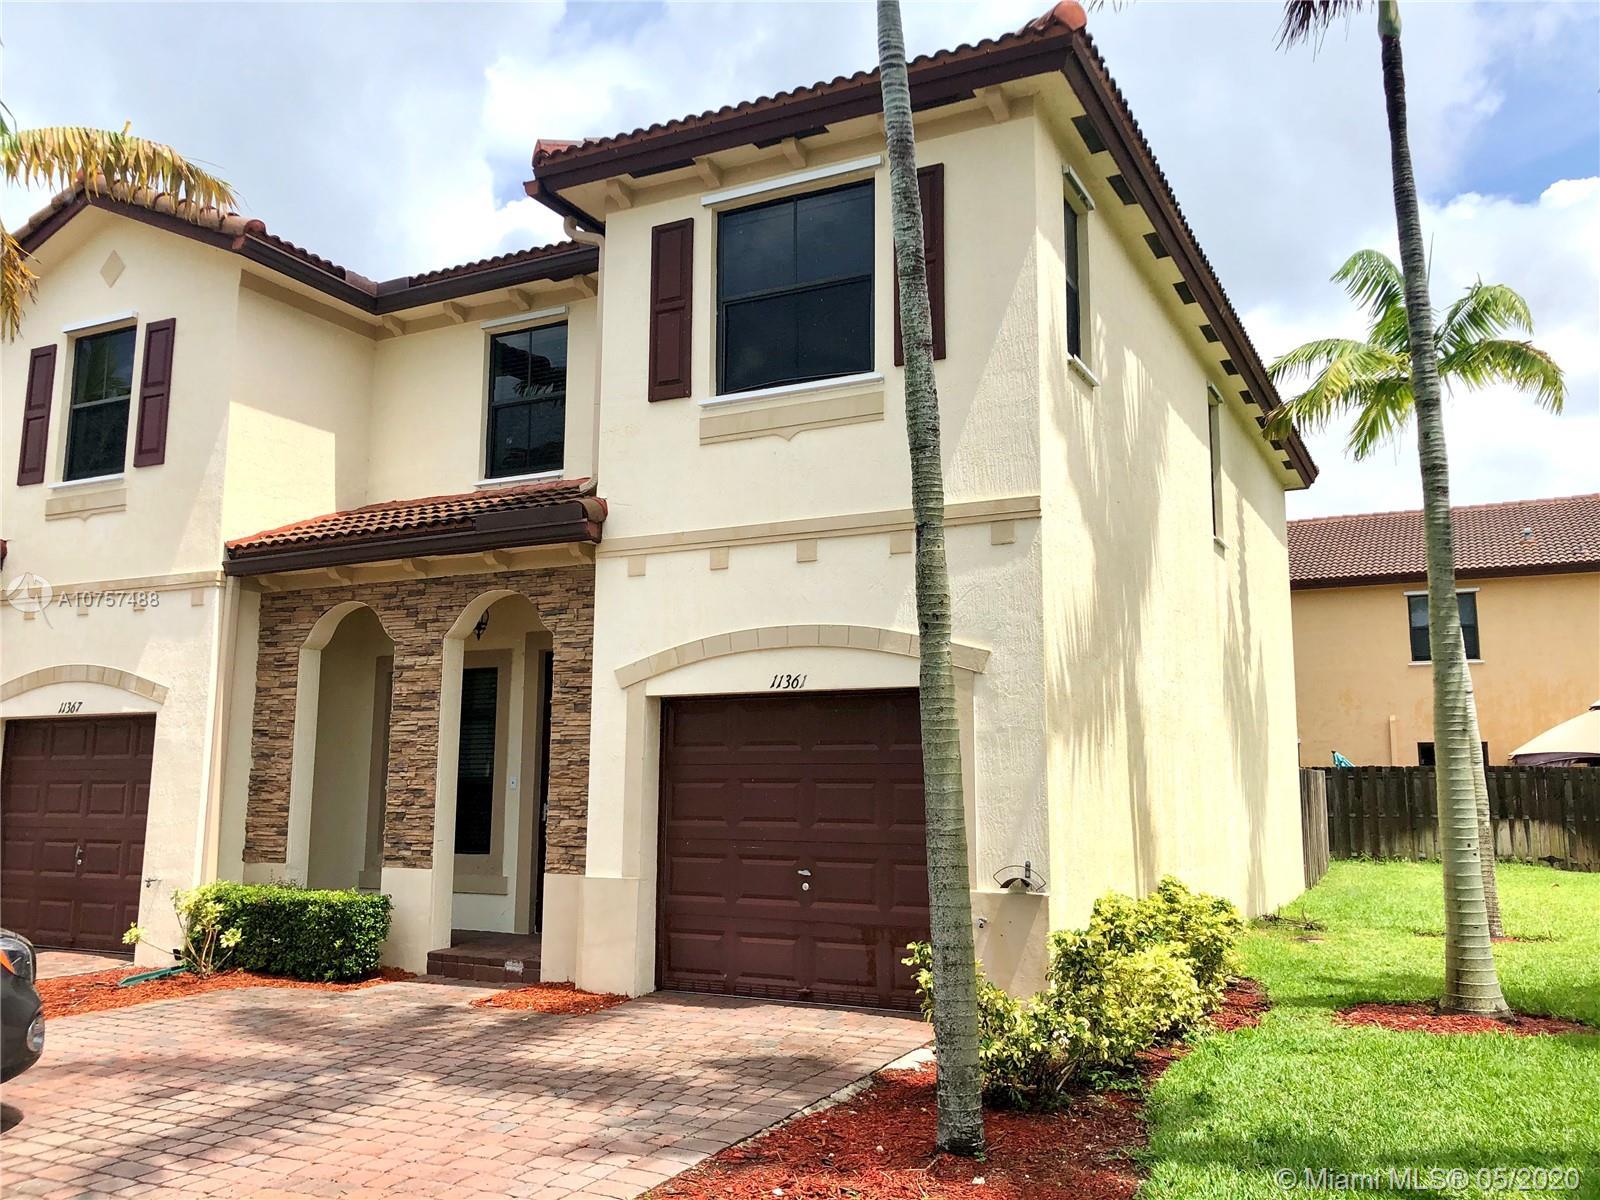 11361 SW 234th St #11361, Homestead, FL 33032 - Homestead, FL real estate listing